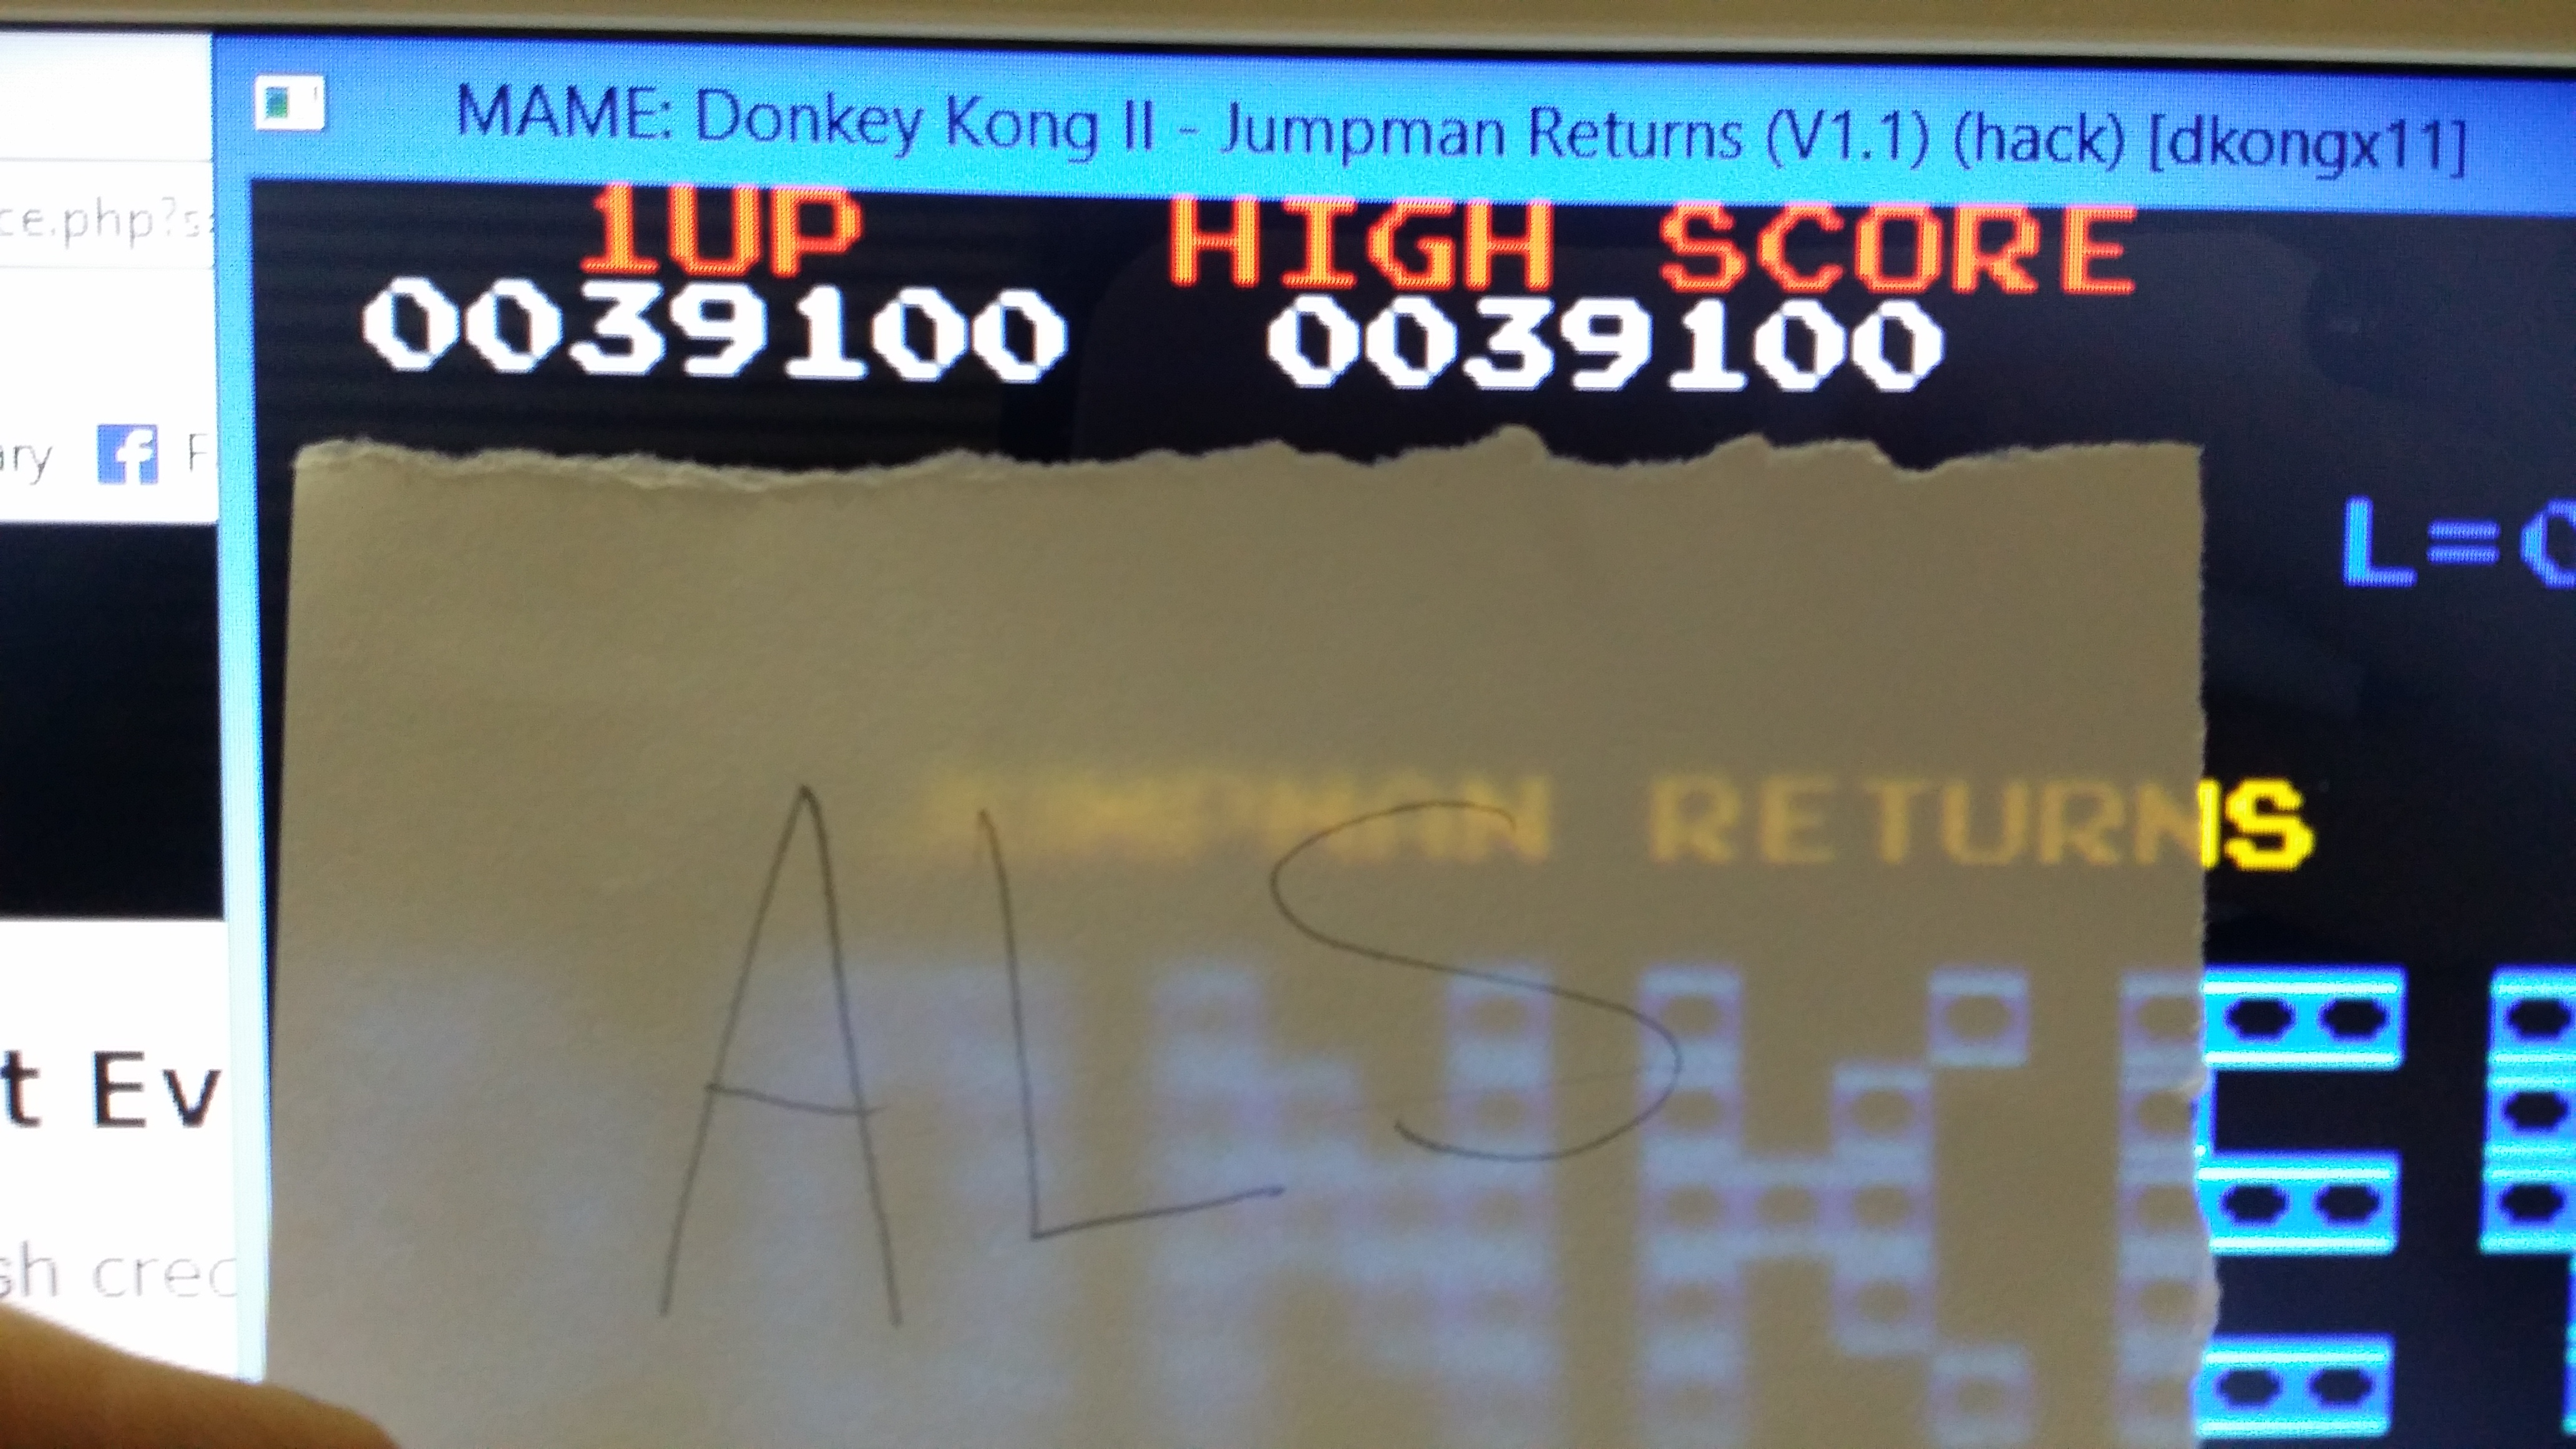 Donkey Kong II: Jumpman Returns [dkongx] 39,100 points